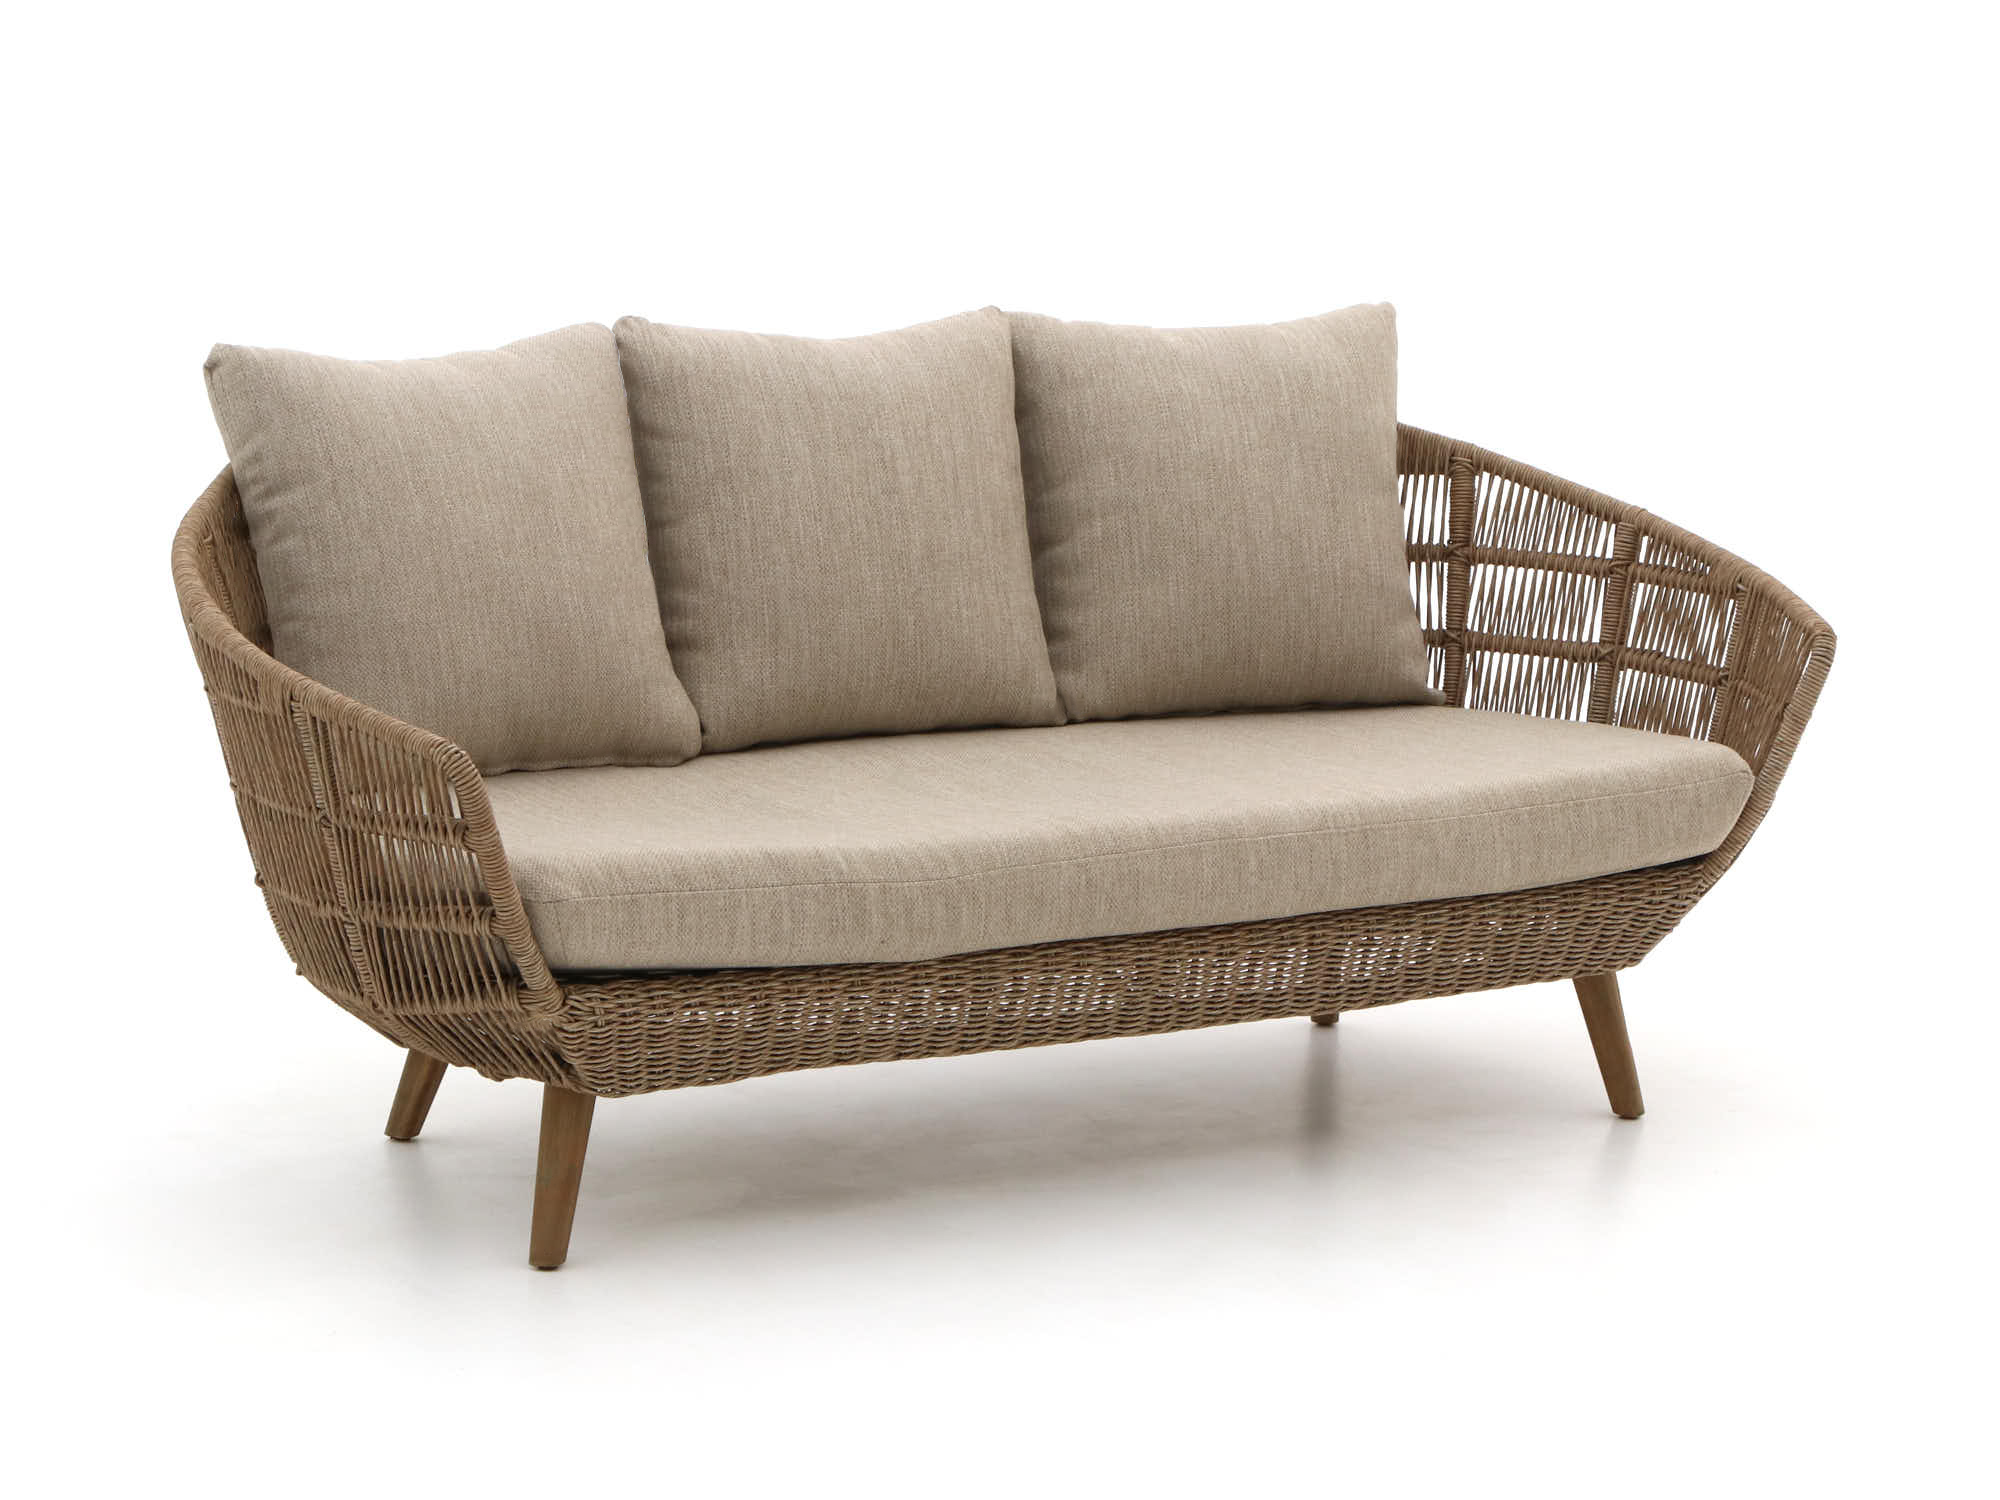 Intenso Stila lounge tuinbank 191cm - Laagste prijsgarantie!